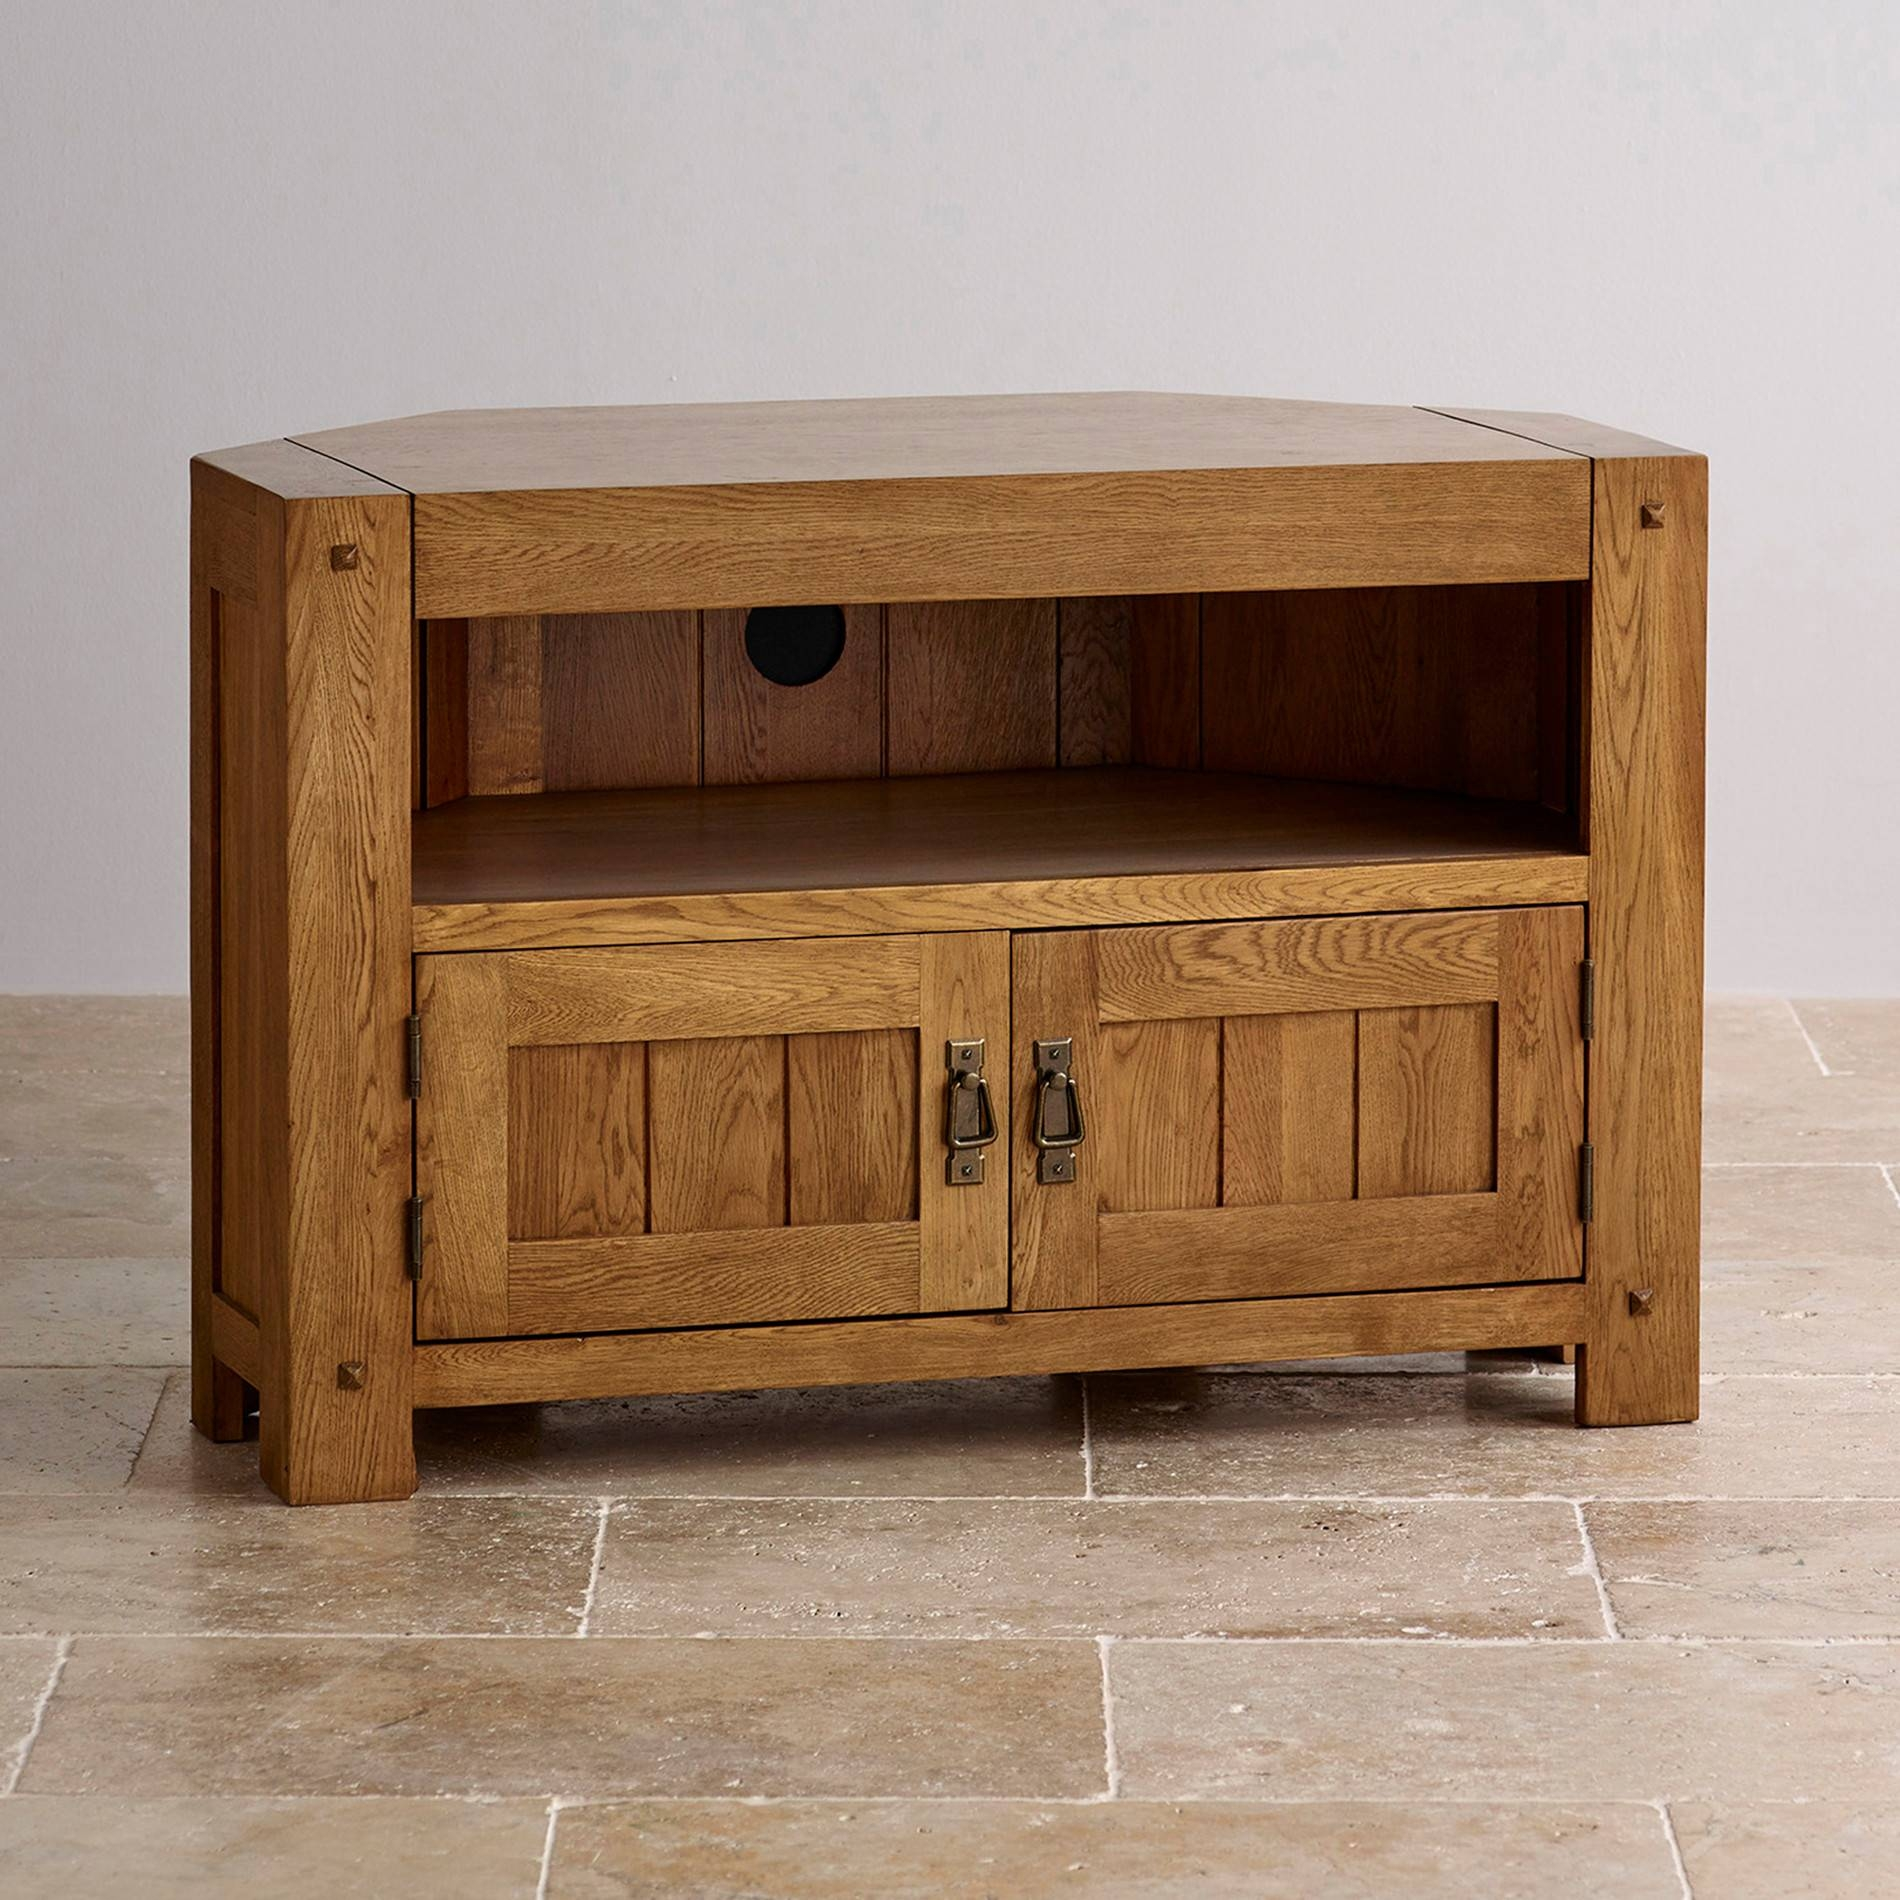 Quercus Corner Tv Cabinet In Rustic Oak | Oak Furniture Land inside Oak Corner Tv Cabinets (Image 11 of 15)